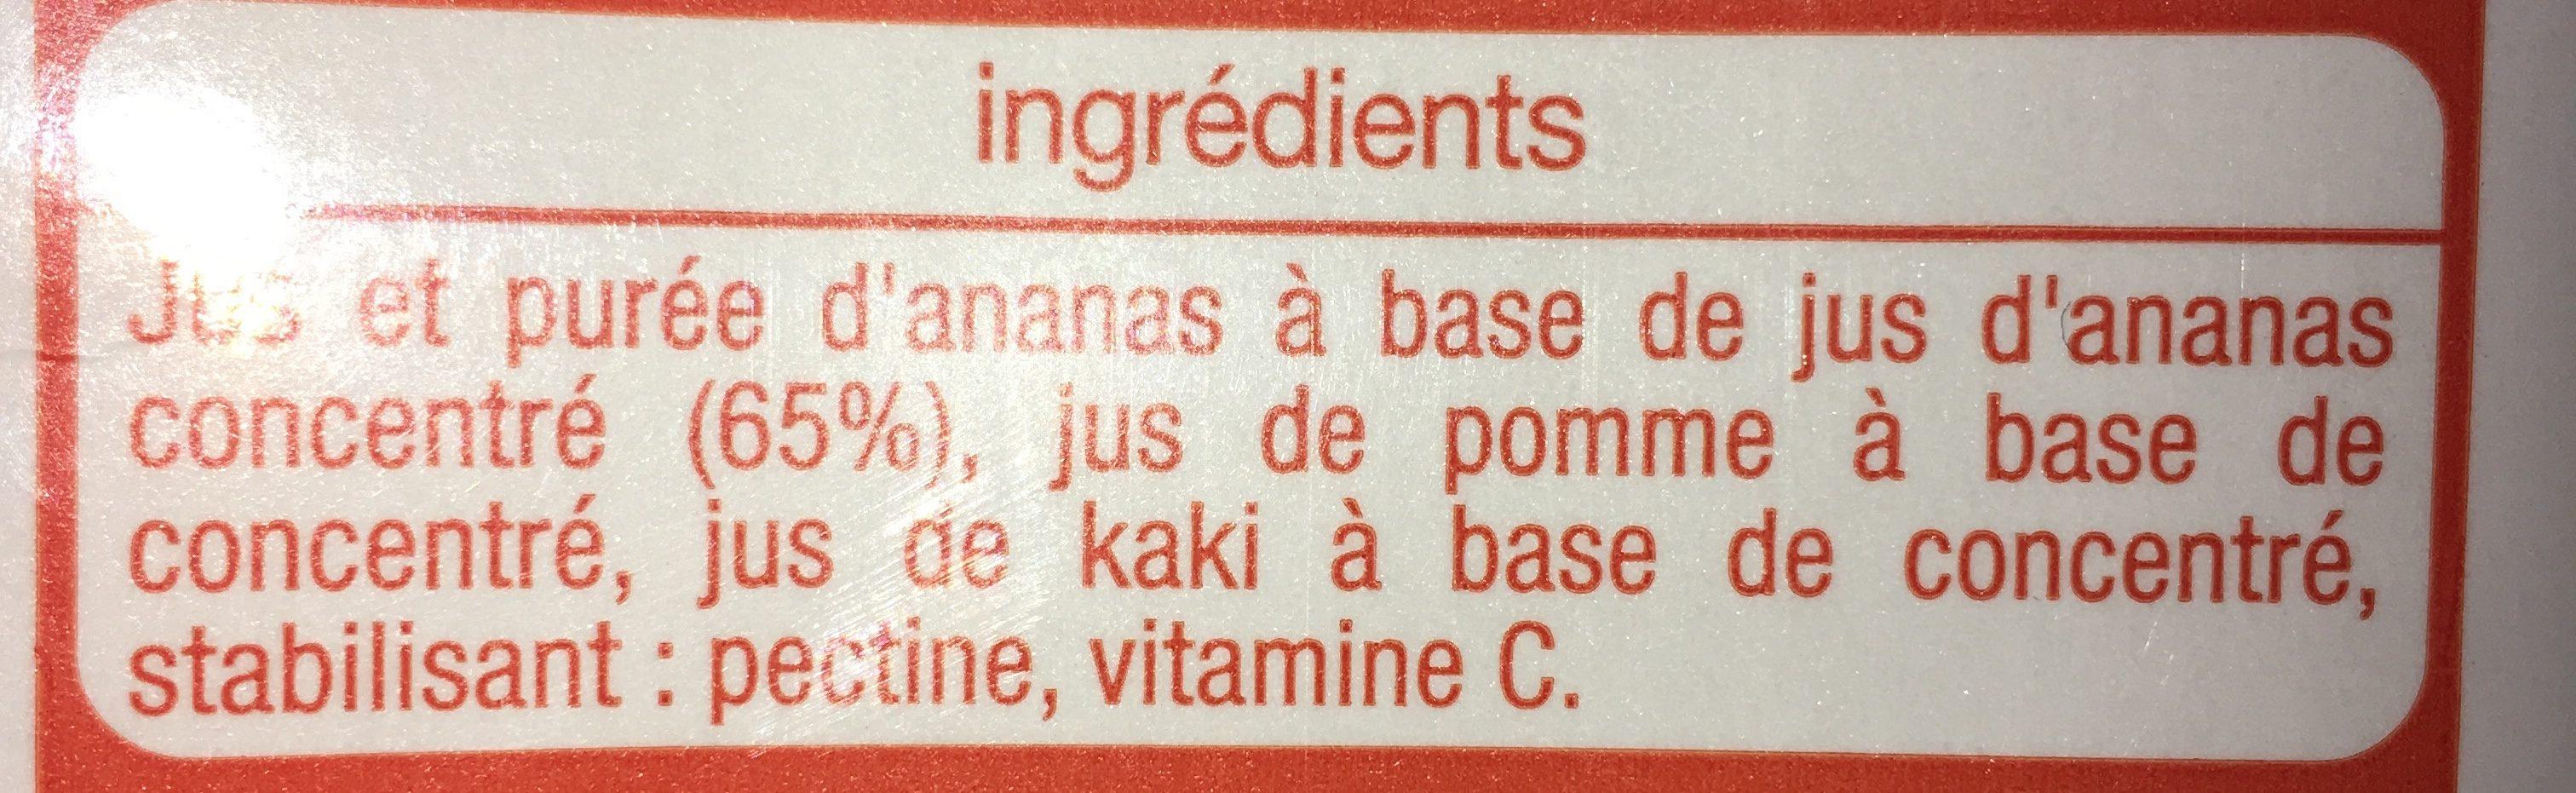 Jus d'ananas multifruits - Ingrédients - fr